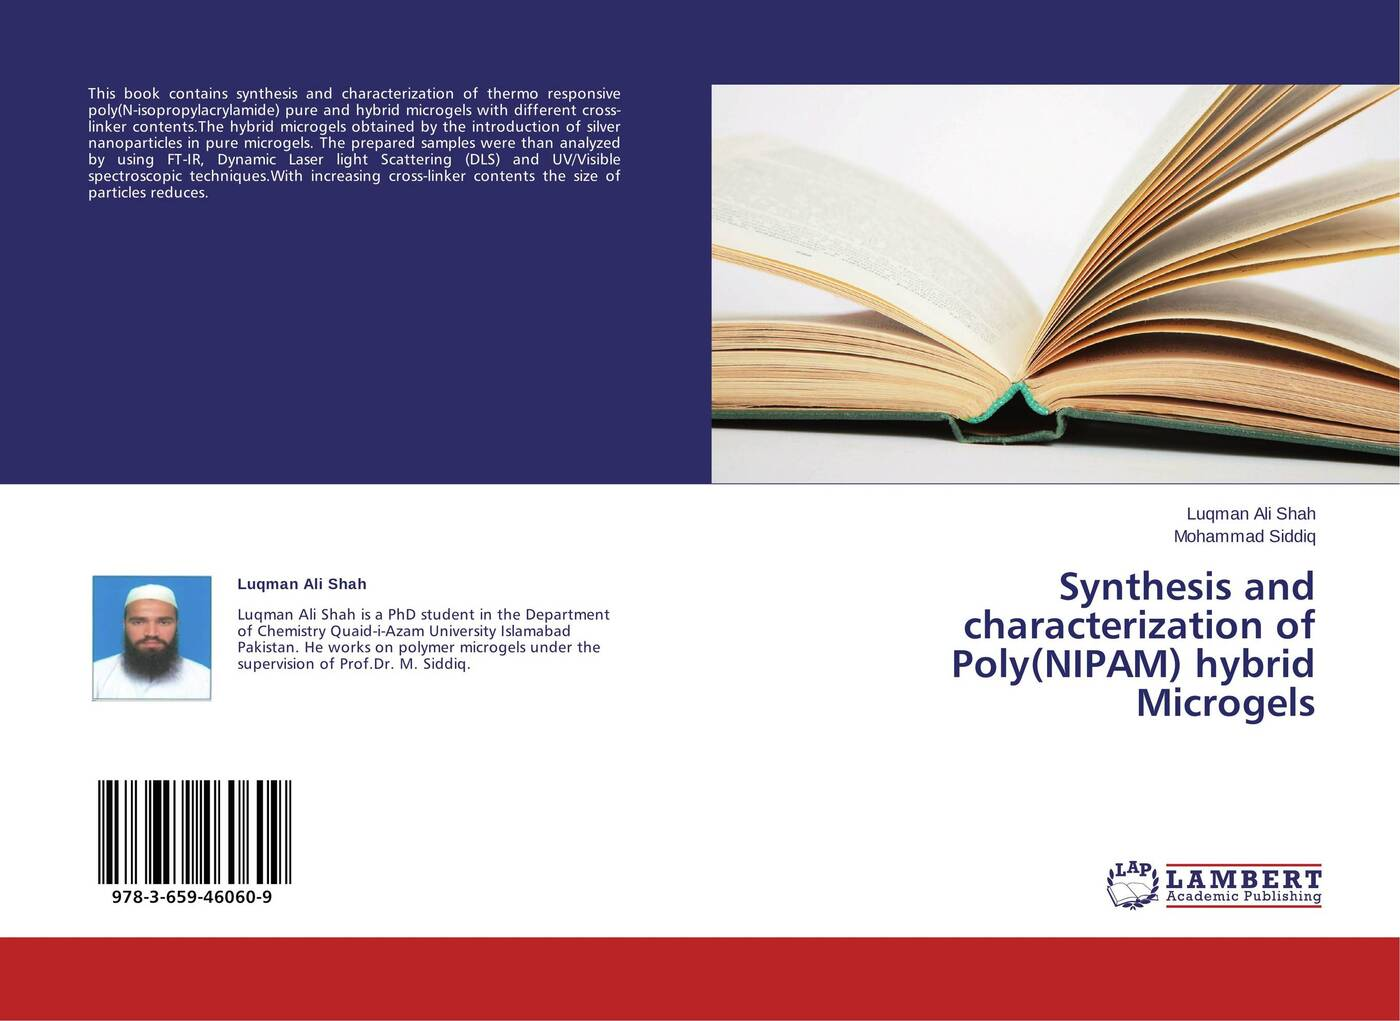 Luqman Ali Shah and Mohammad Siddiq Synthesis and characterization of Poly(NIPAM) hybrid Microgels недорго, оригинальная цена